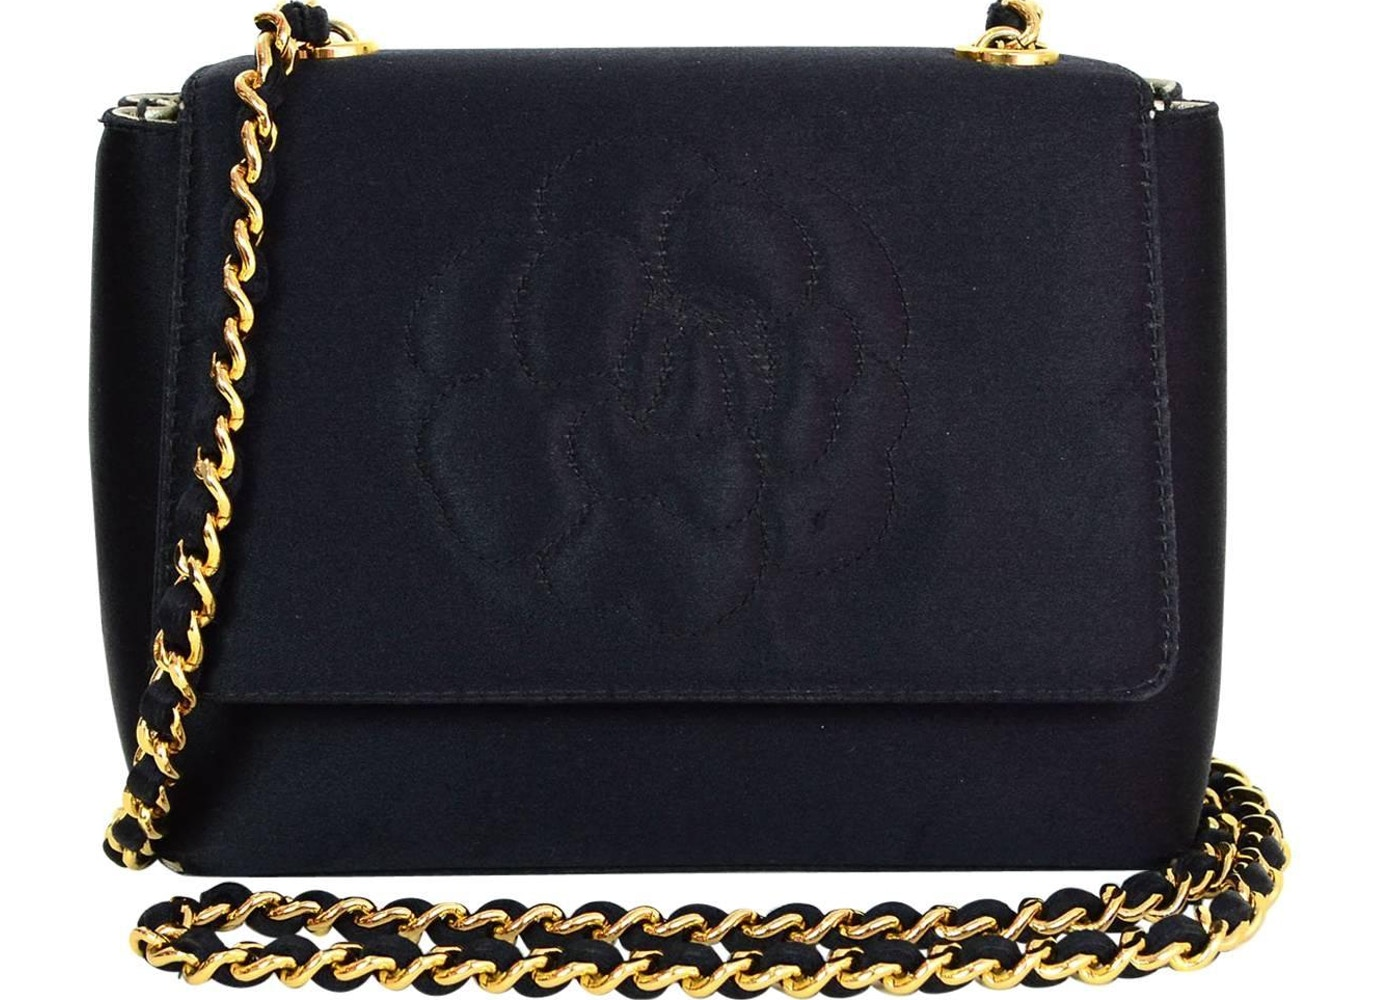 95907d1e21335 Chanel Vintage Camellia Flap Bag Satin Mini Black